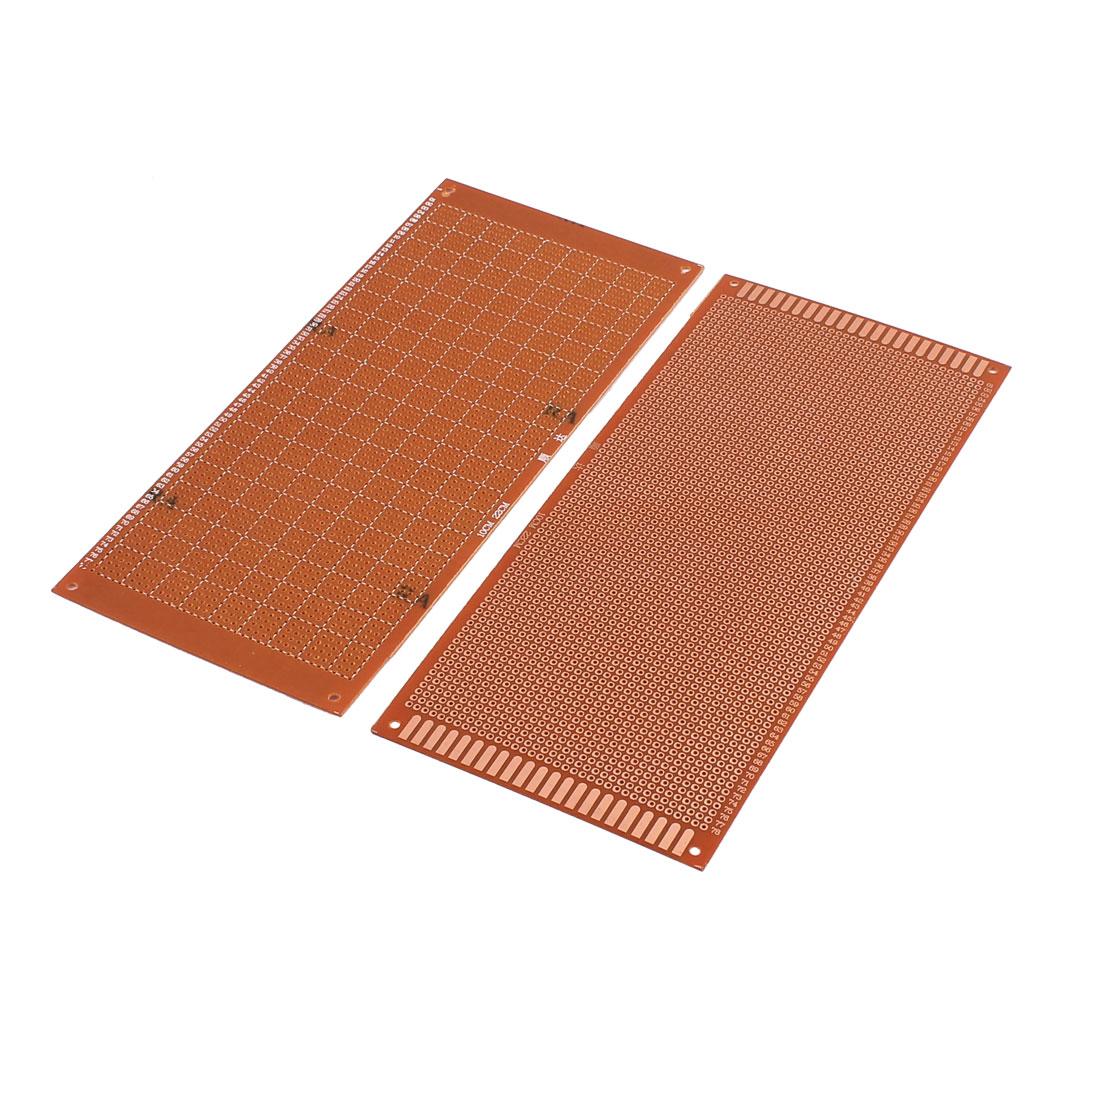 2 Pcs Prototyping Experiment Tester Matrix PCB Circuit Plate Board 10cm x 22cm